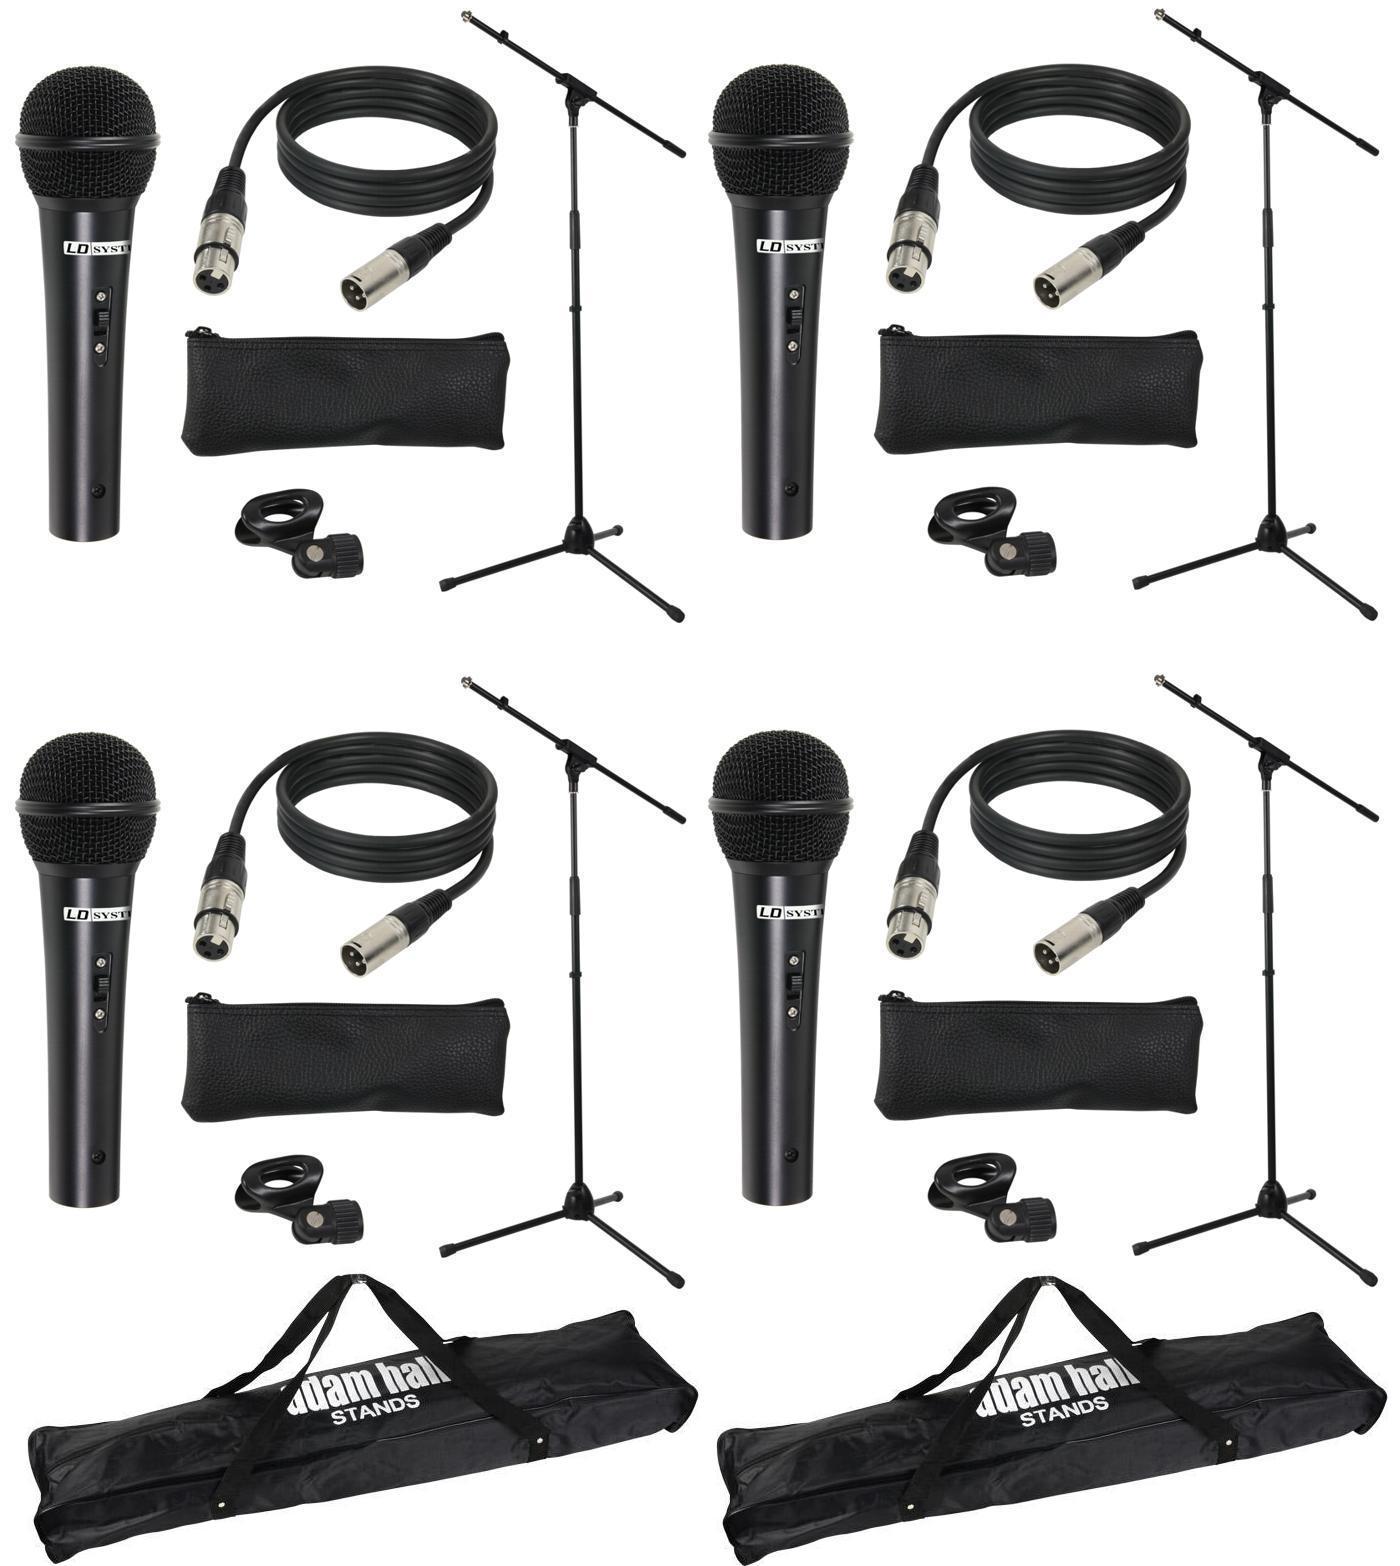 Stativ 6 Sets LD Systems MICSET1 mit Handmikrofon 5m Mikrofonkabel 3x Tasche